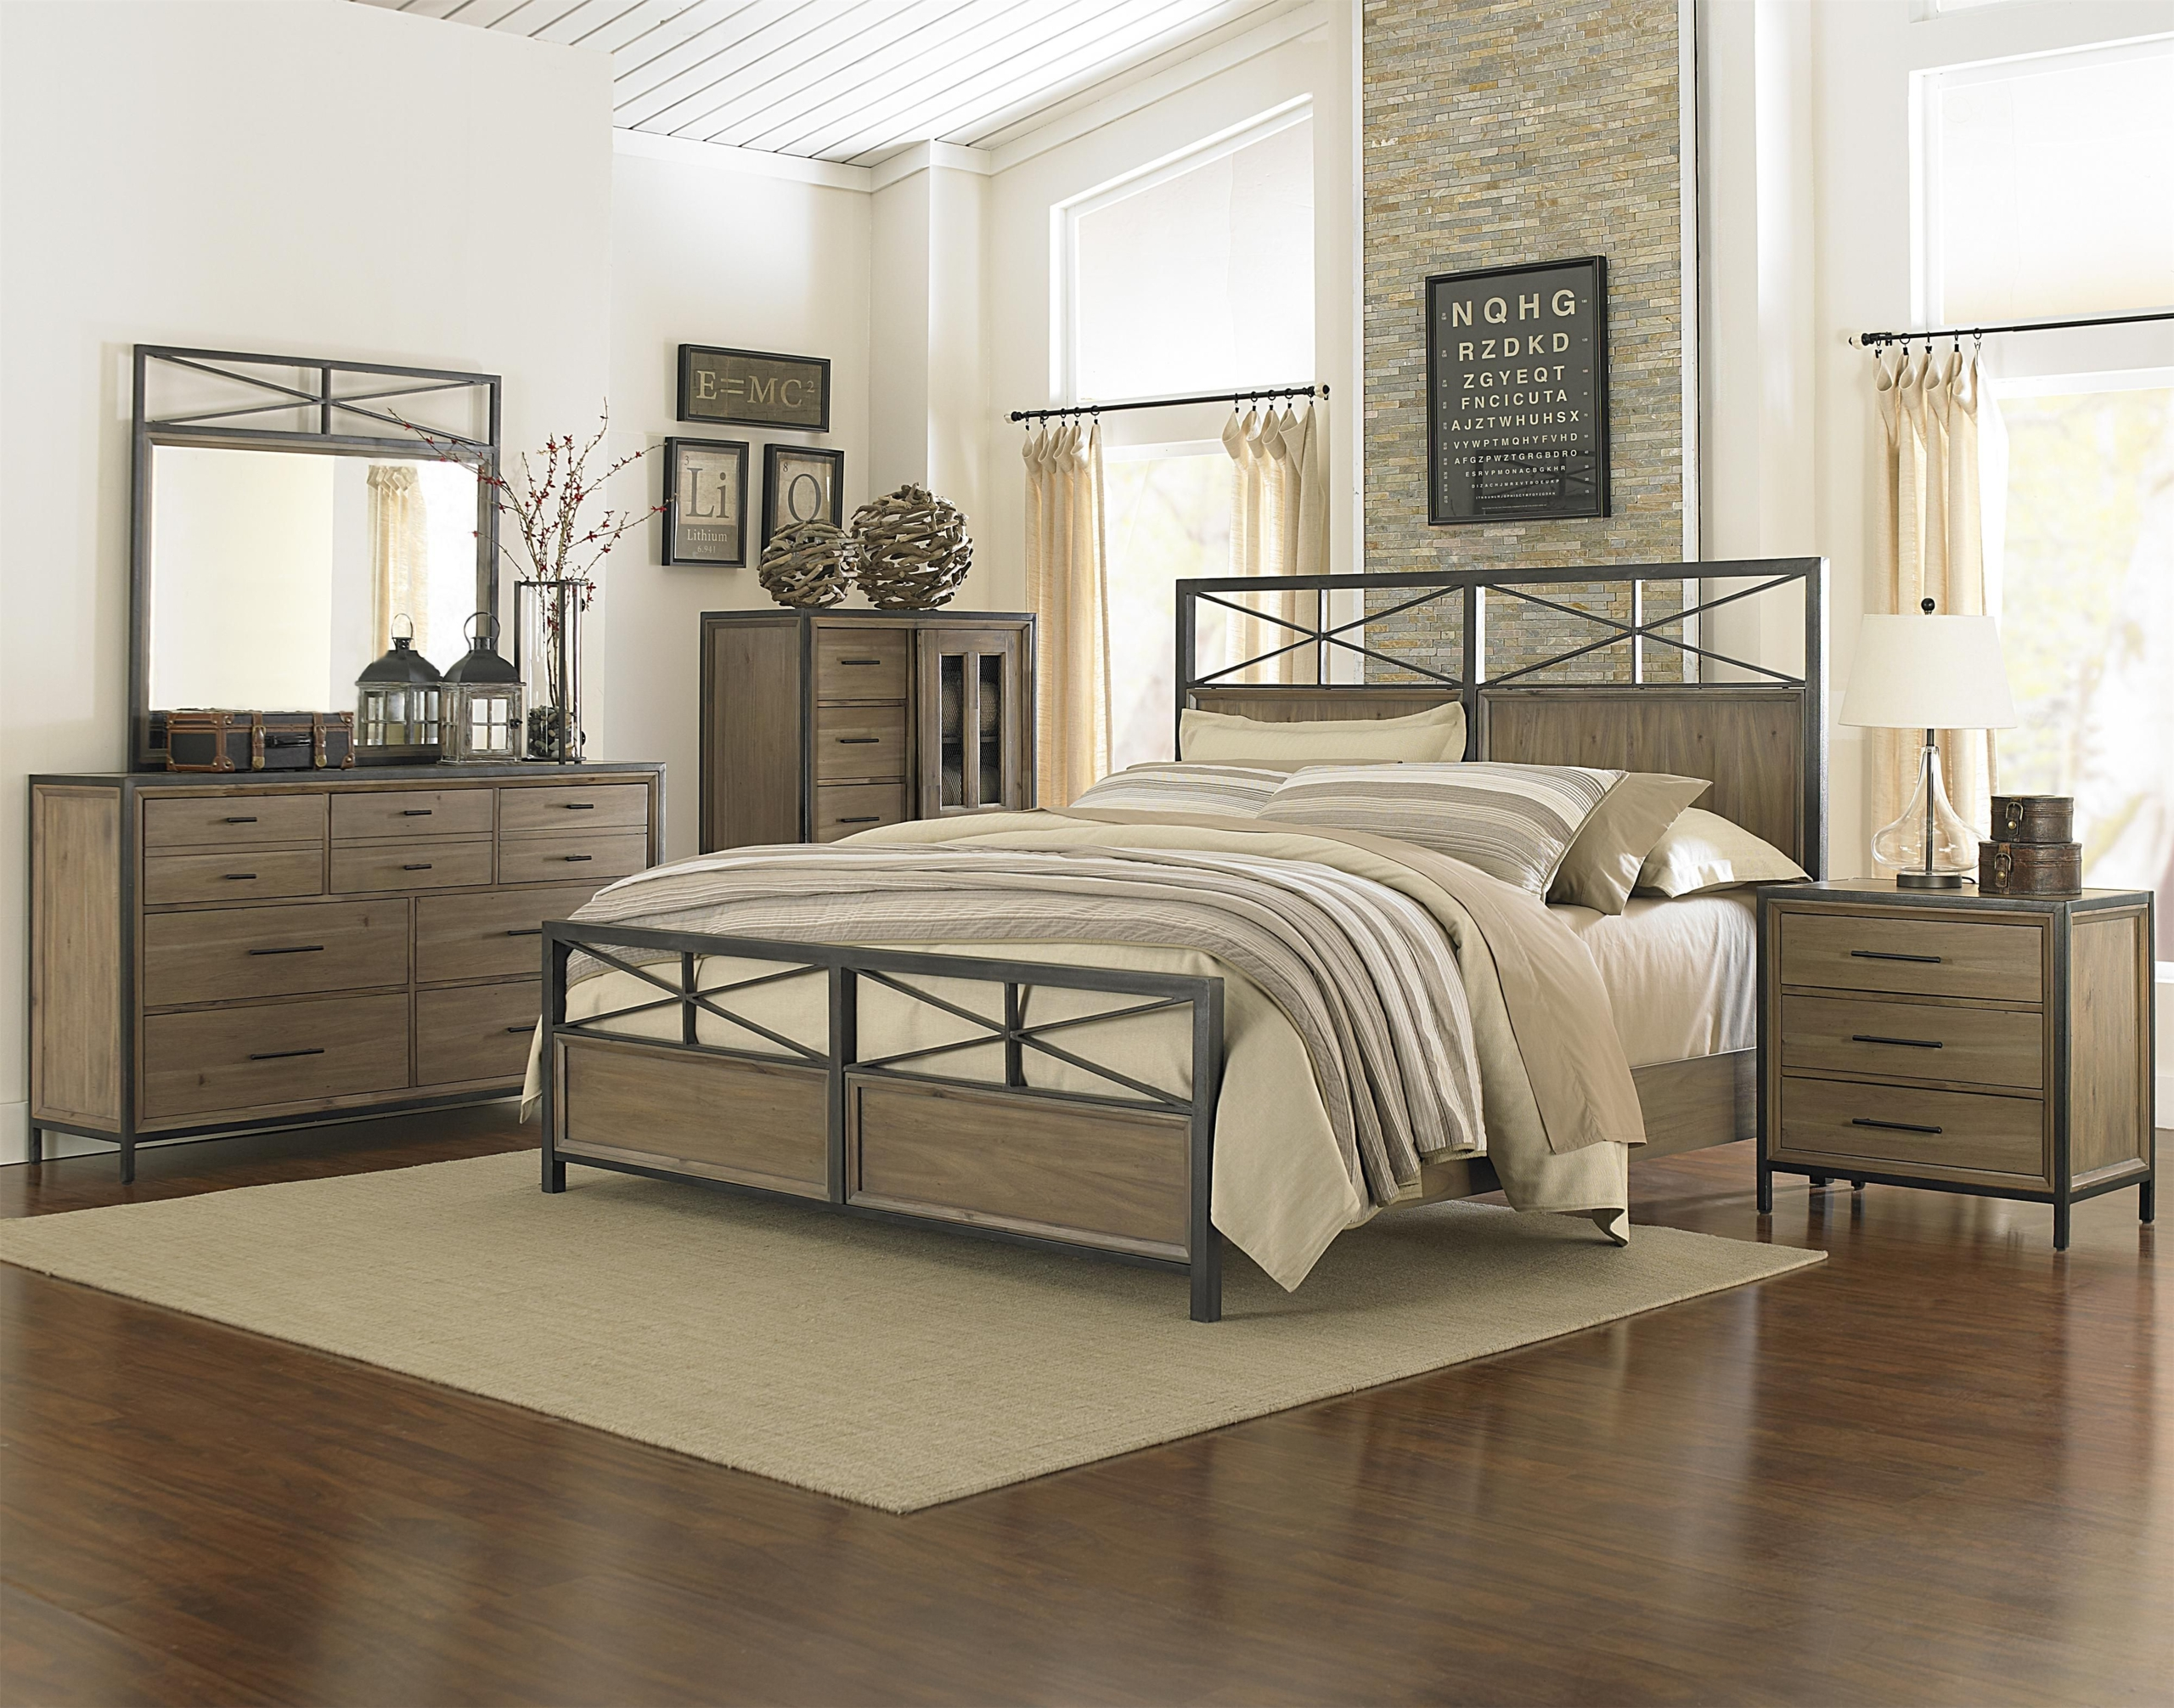 Superbe Metal And Wood Bedroom Sets 15